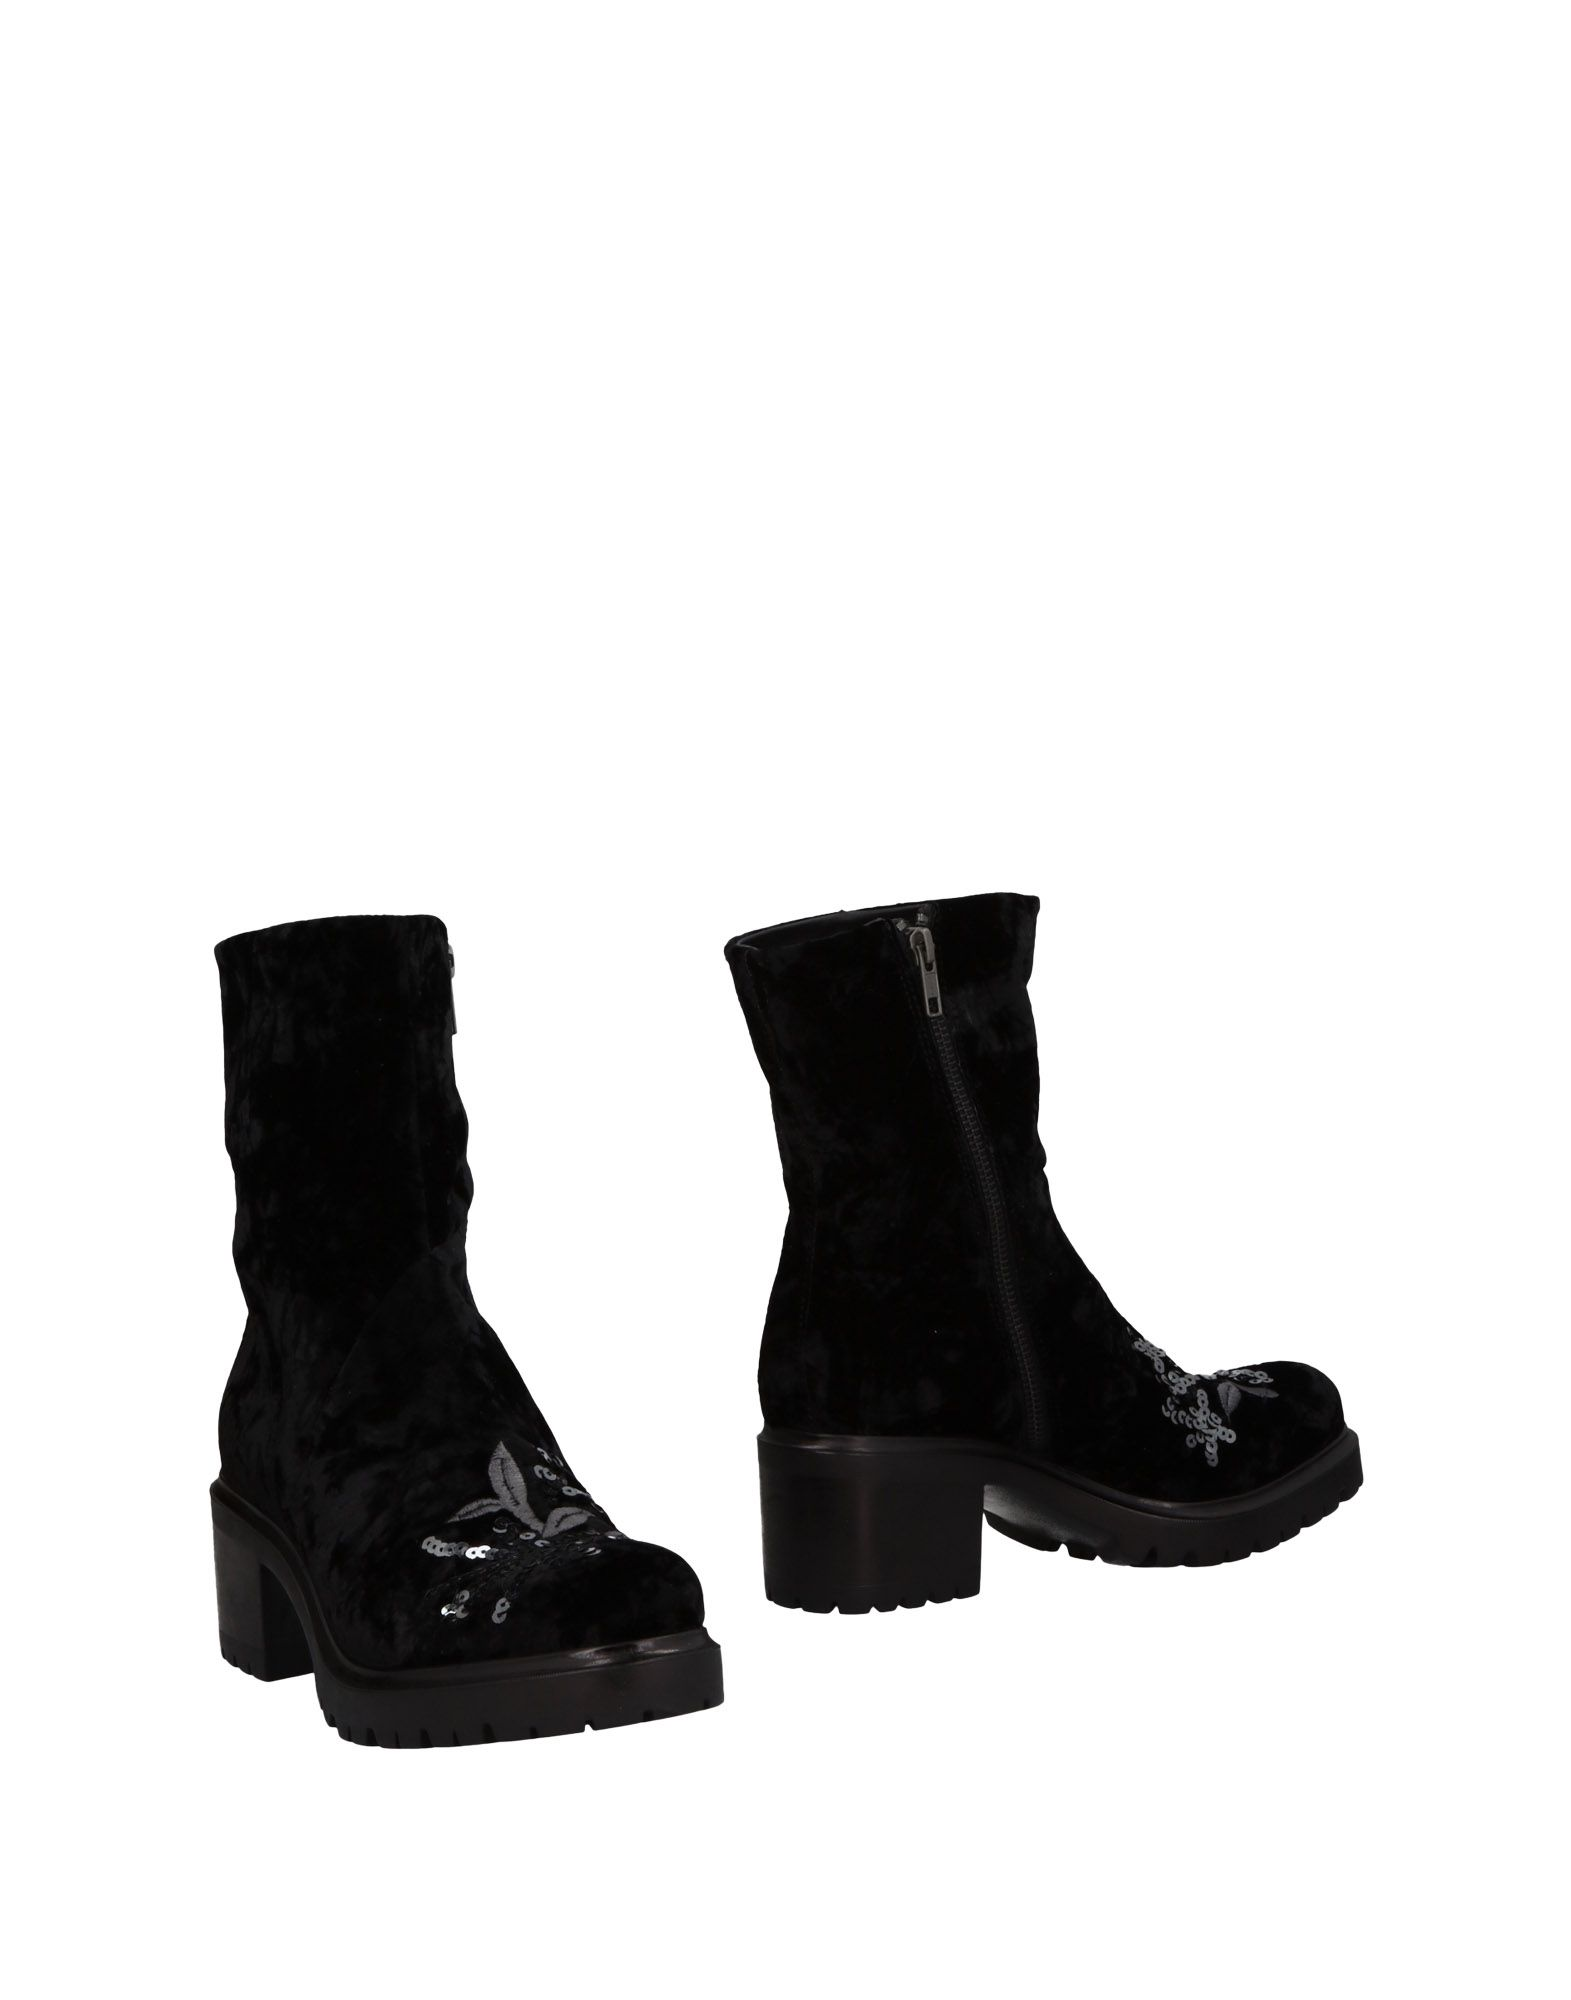 Alexander Hotto Stiefelette Damen  11474033RUGut aussehende aussehende aussehende strapazierfähige Schuhe 7f5b0d